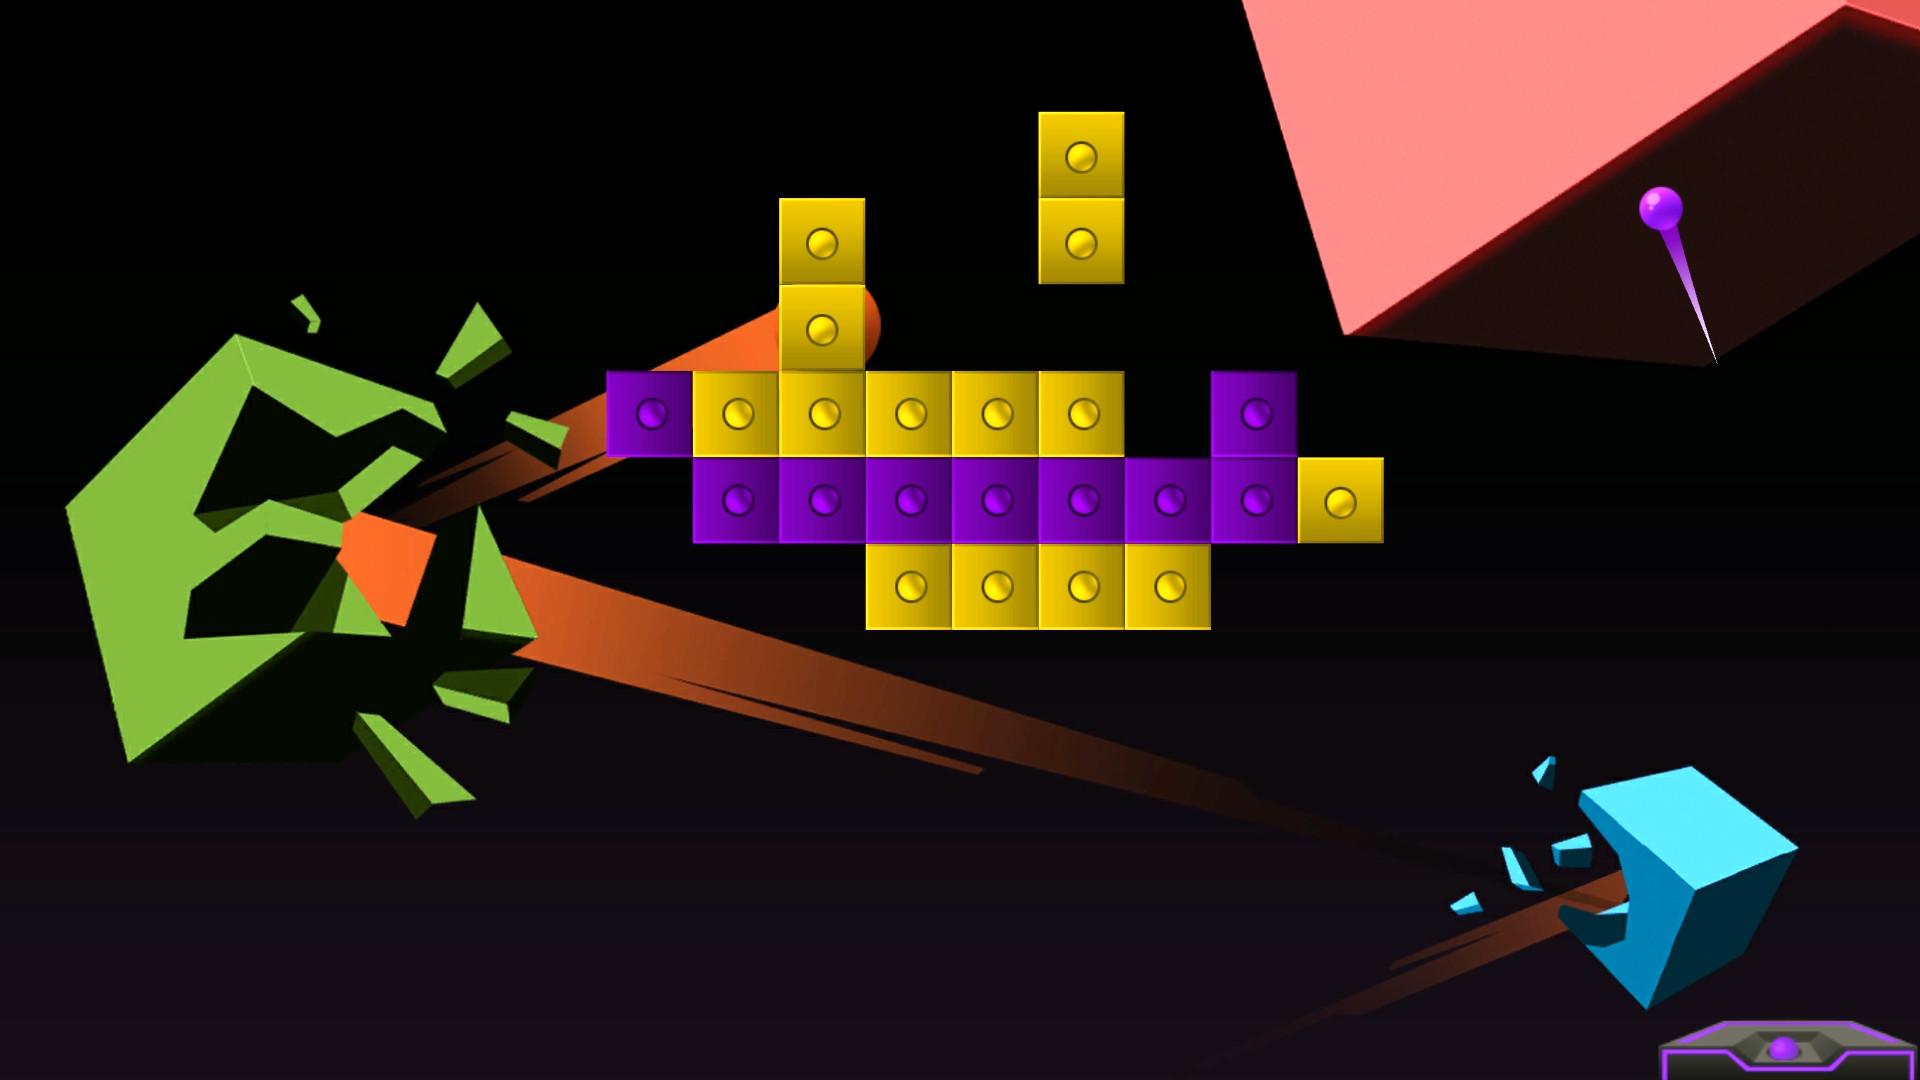 BAX (Brick-breaker) Ss_2bcd30f30b7d2c57443a7d76a12e10449d49aac1.1920x1080